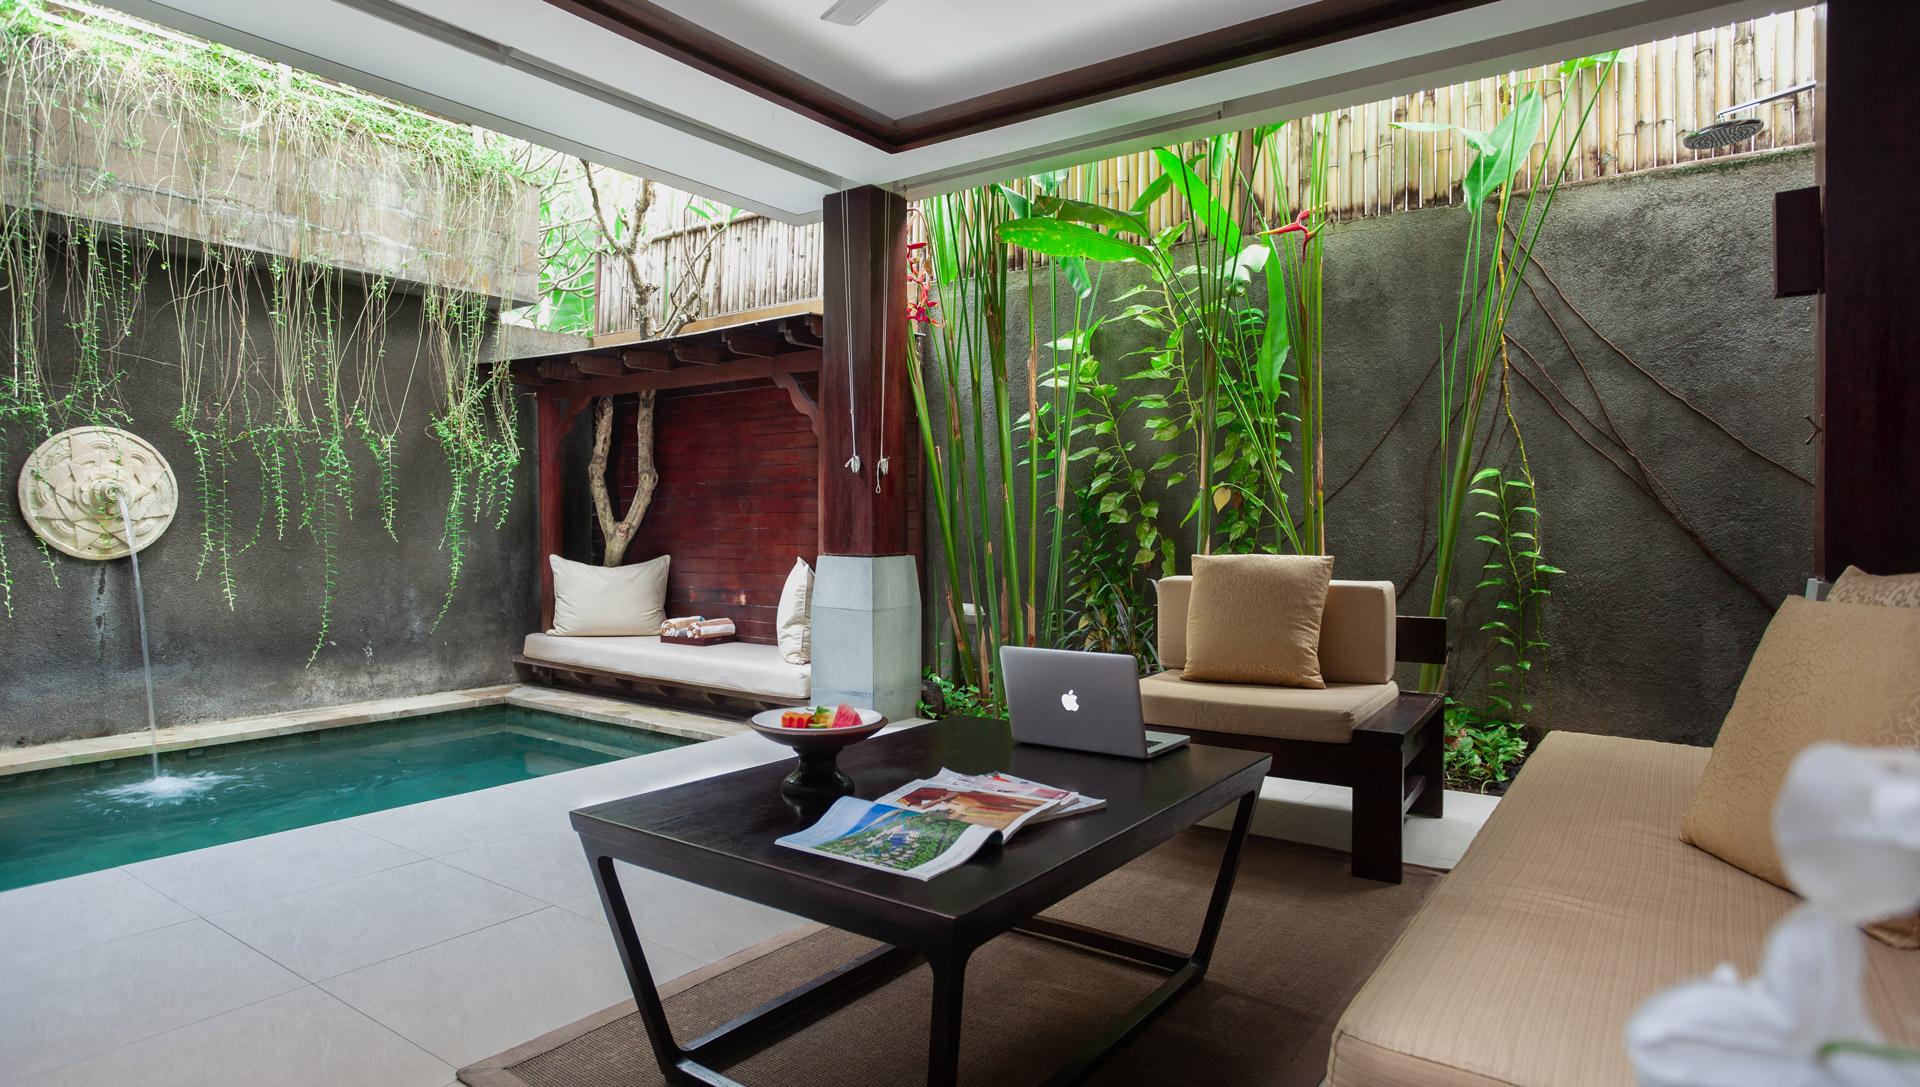 Tanadewa Nusa Dua - One Bedroom Villa Living Room Private Pool  Interior Photo